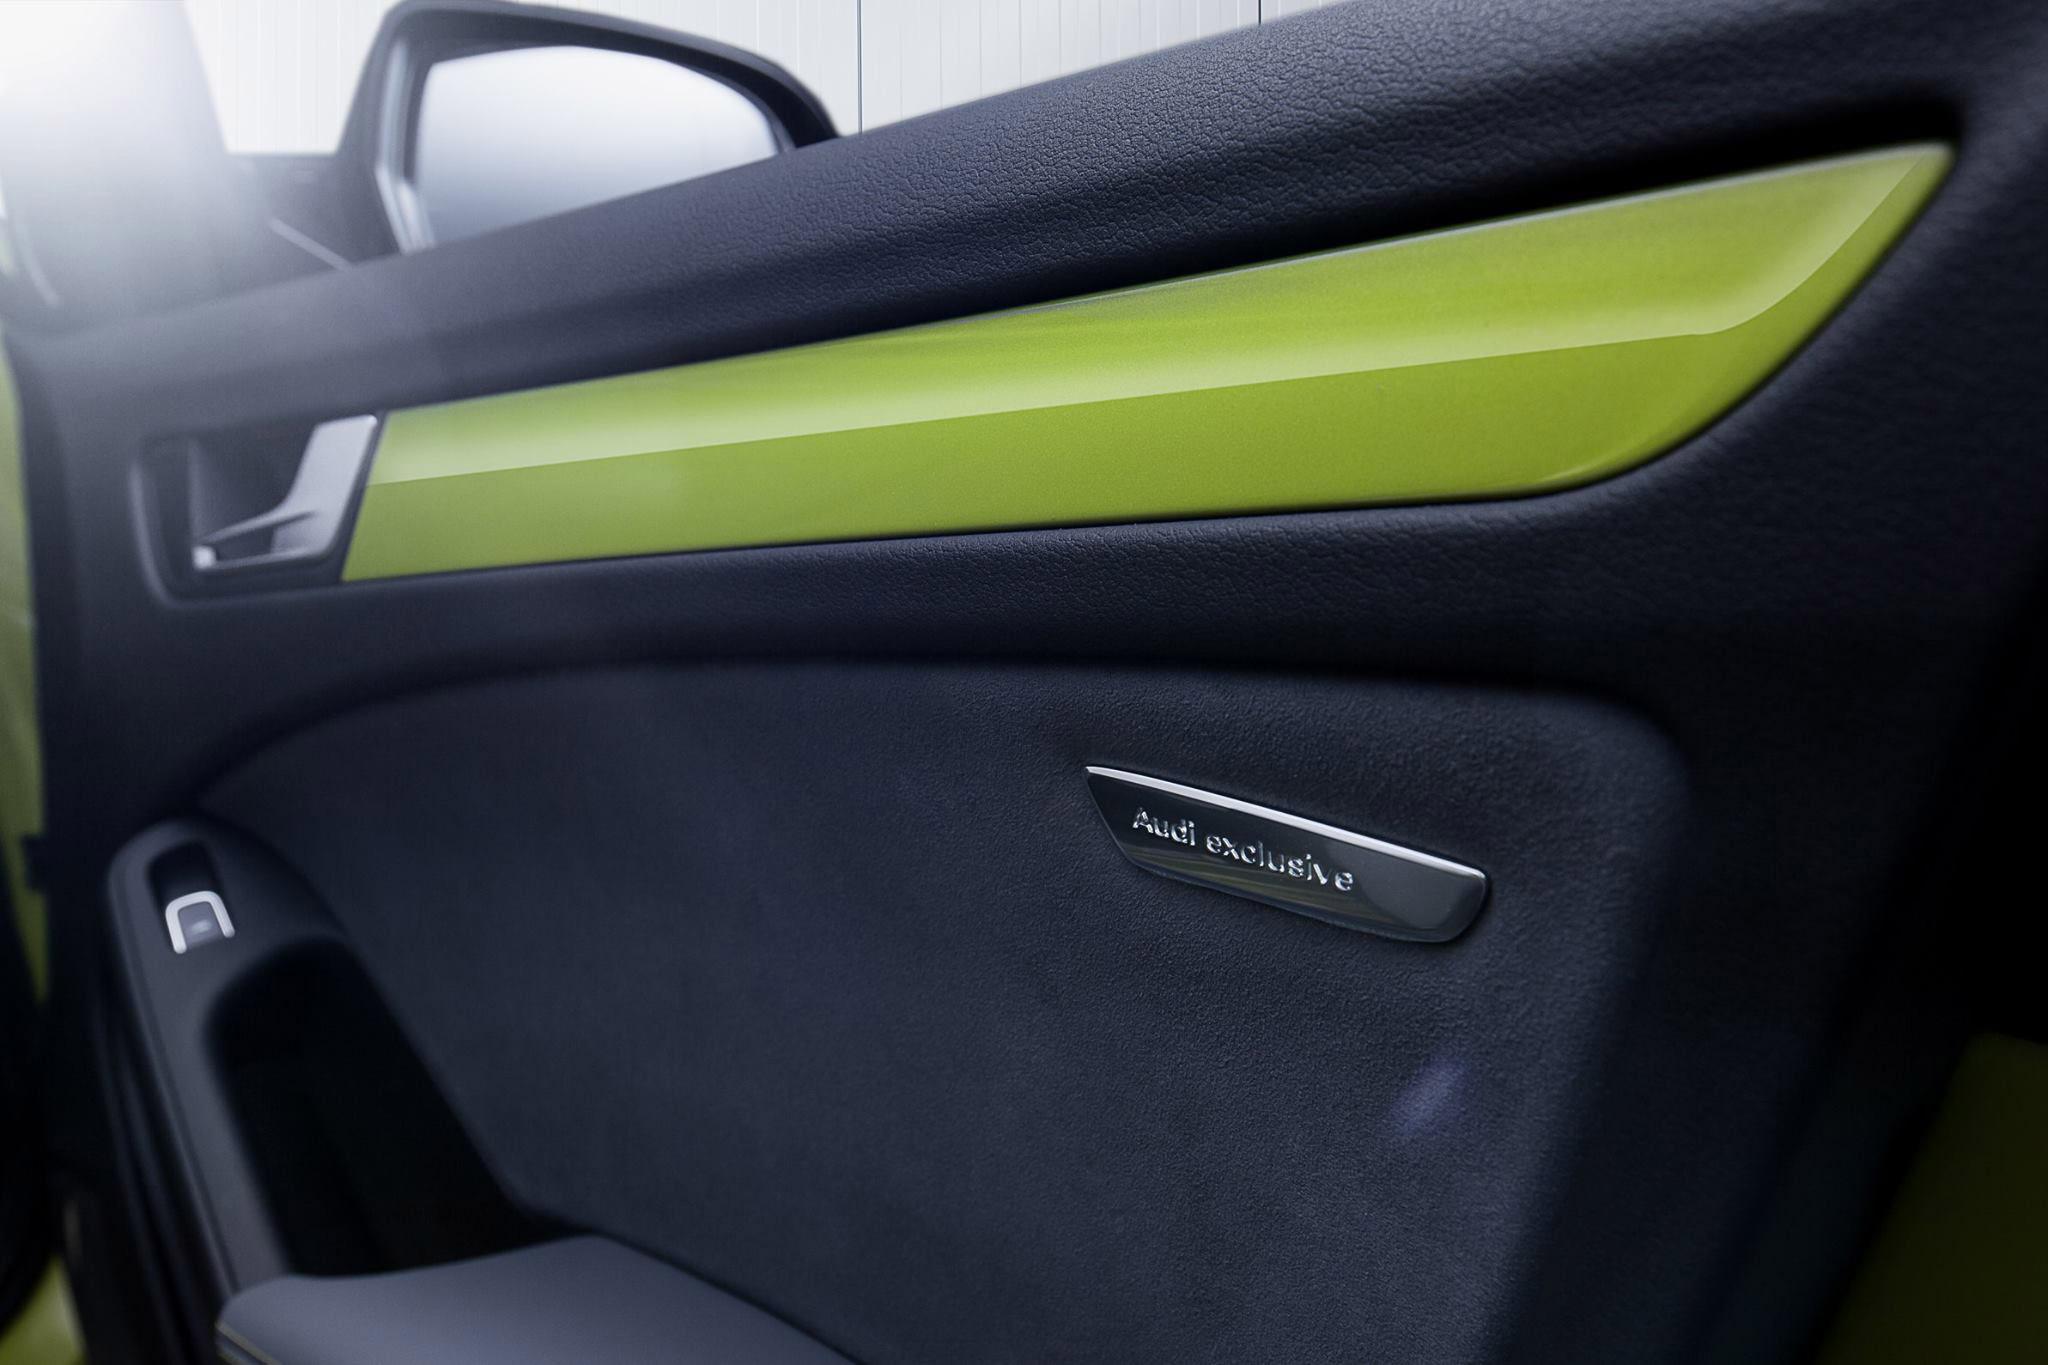 http://www.automobilesreview.com/gallery/audi-rs-4-avant-peridot-metallic/audi-rs-4-avant-peridot-metallic-04.jpg